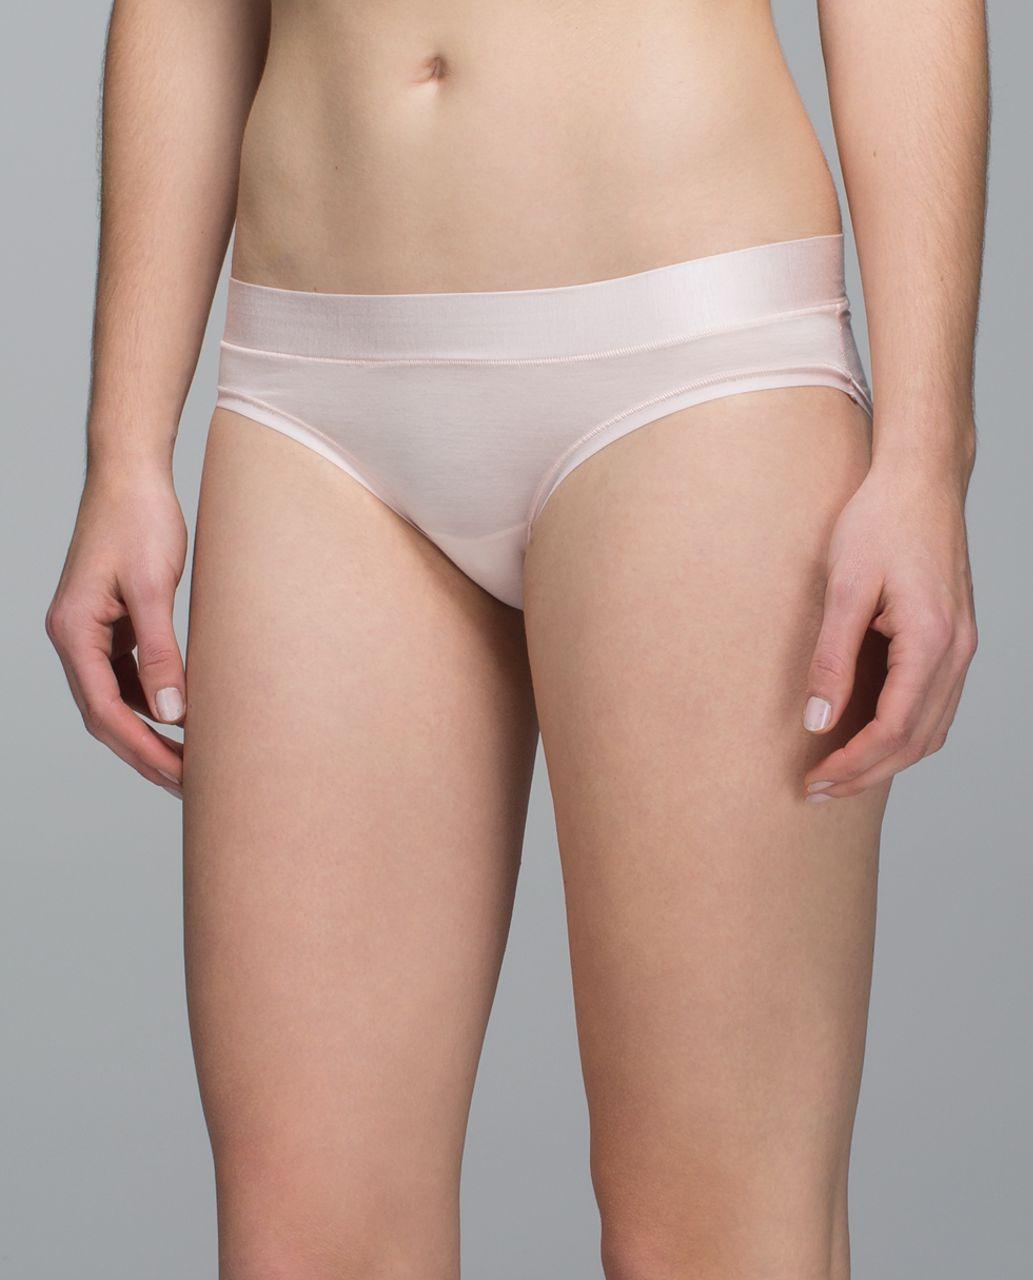 Lululemon Mula Bandhawear Bikini - Parfait Pink